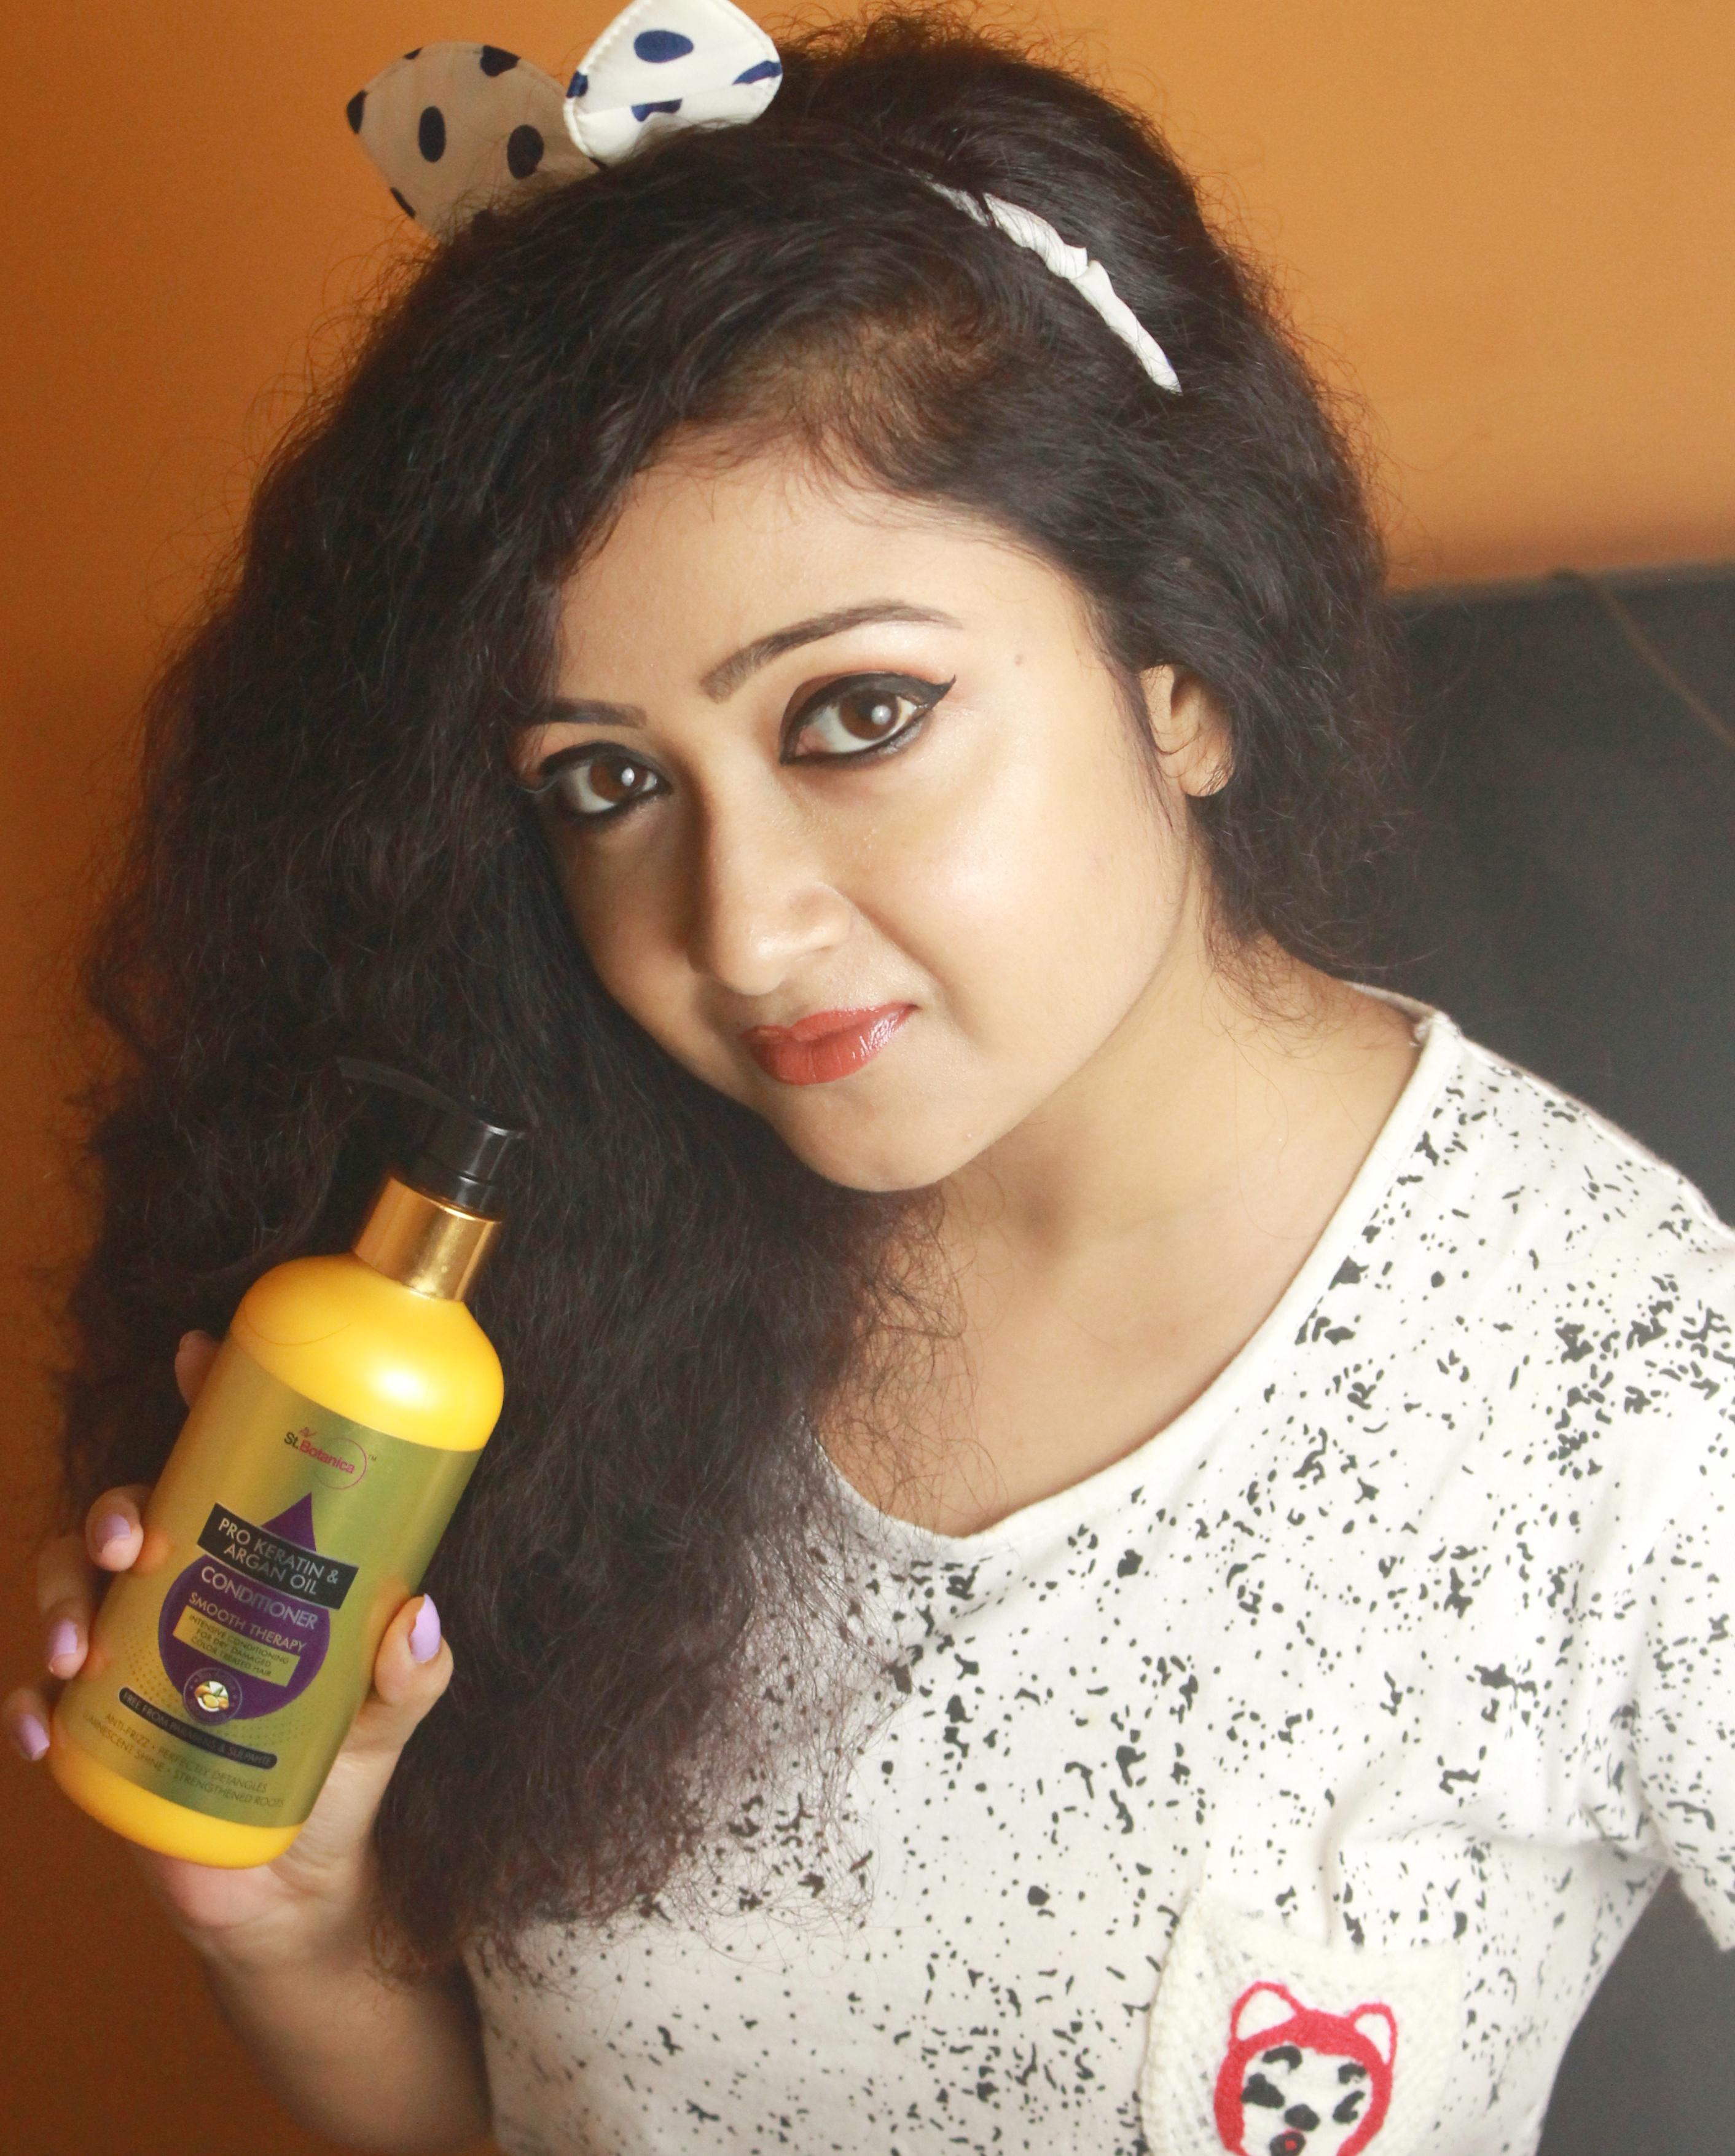 StBotanica Pro Keratin & Argan Oil Conditioner pic 2-Salon like smooth hair!-By debolina_sen